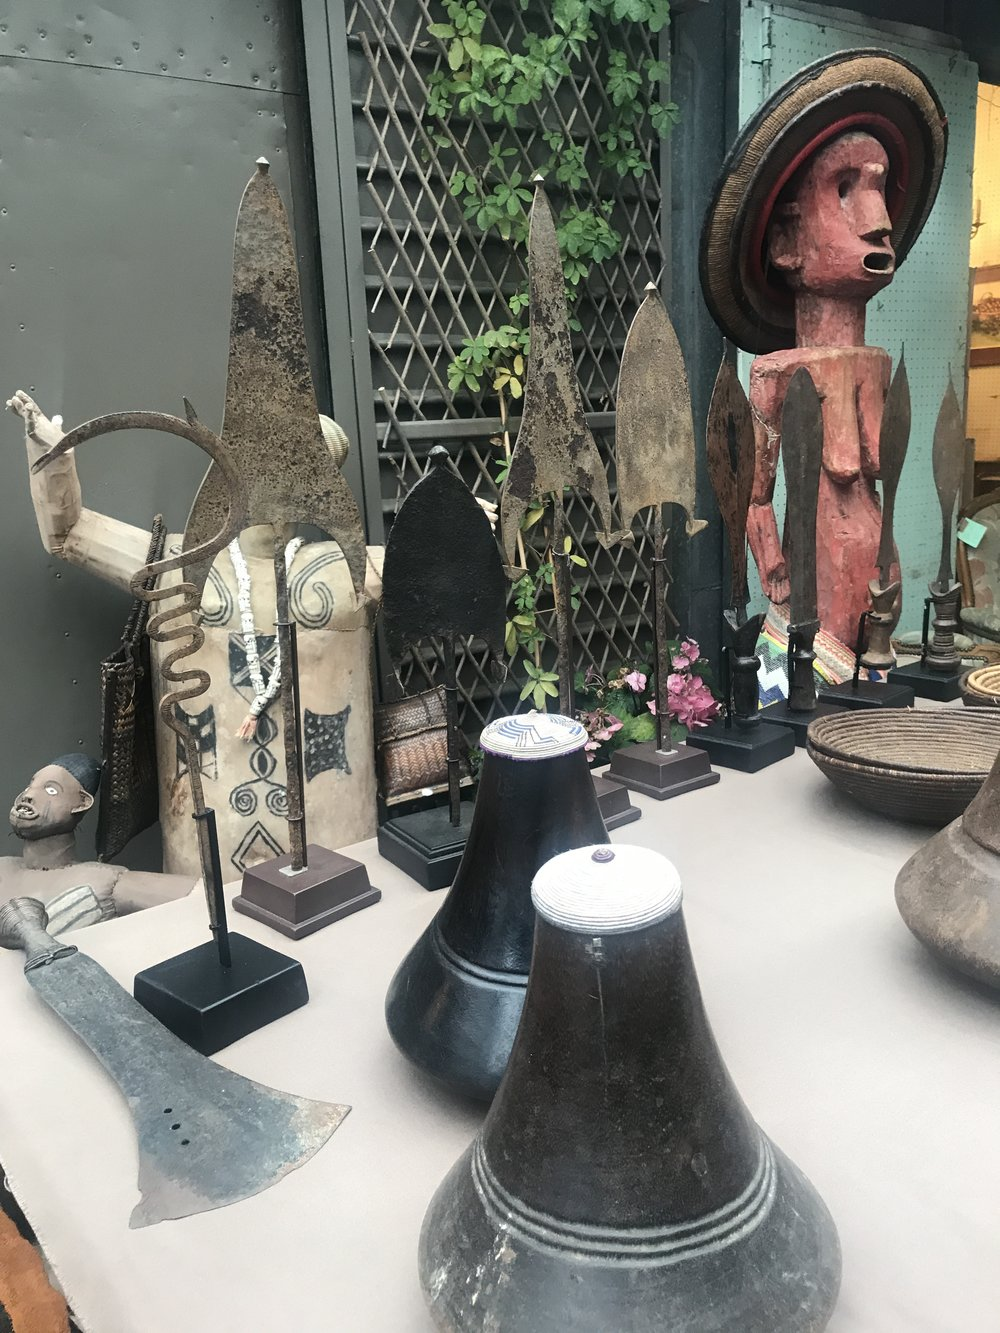 Some more native treasures at the Paris Flea